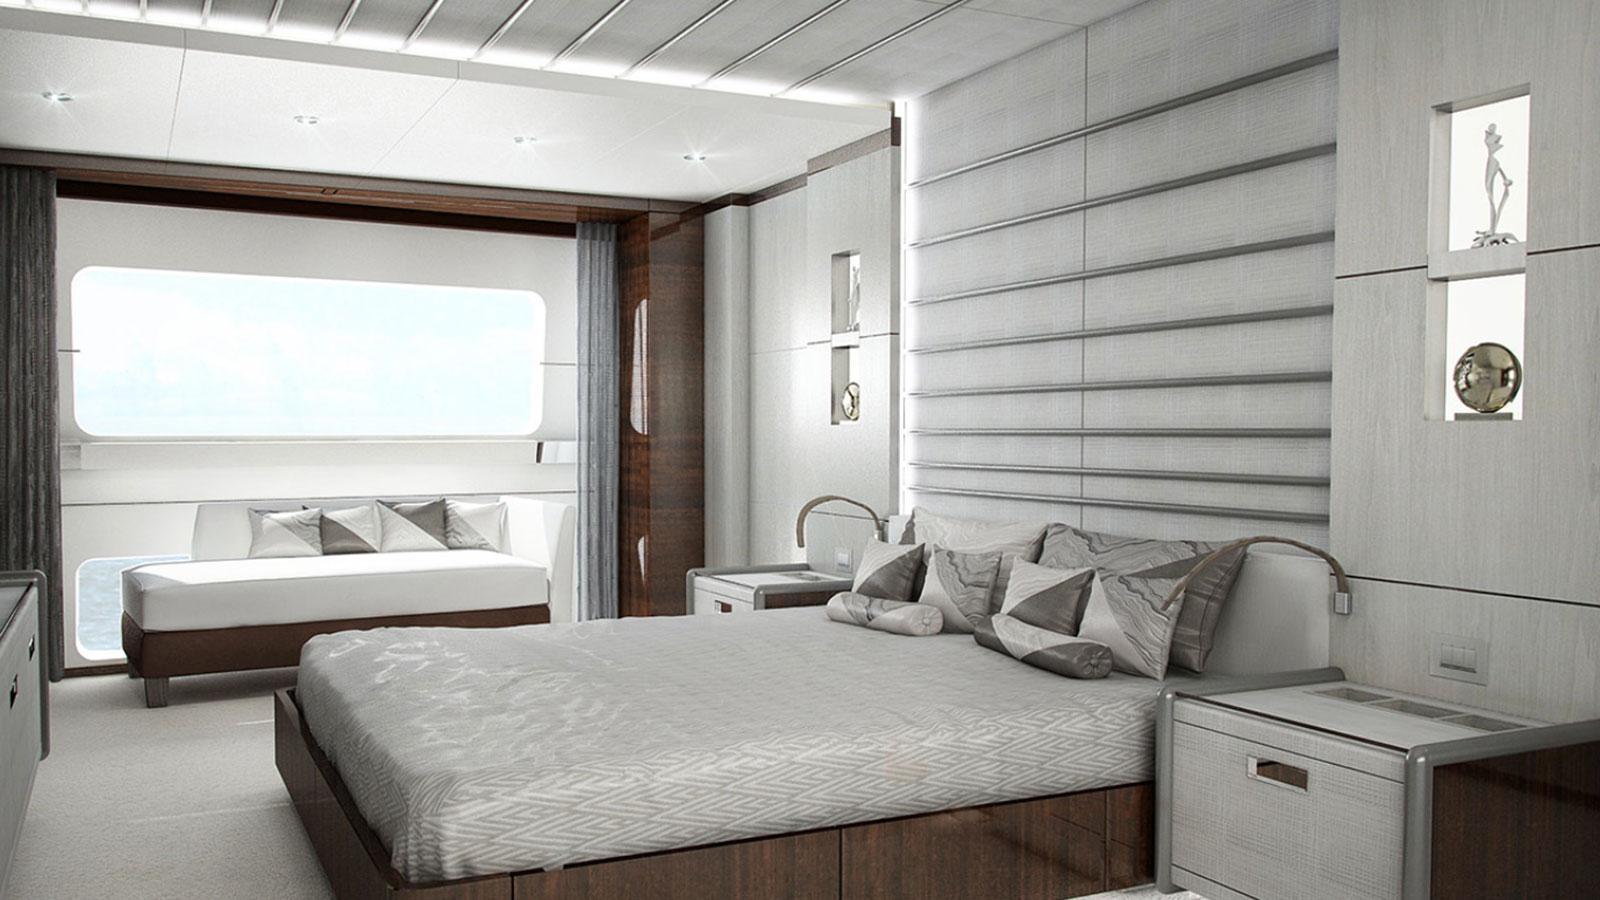 Benetti Supreme 132 motoryacht Benetti 40m 2020 master sistership